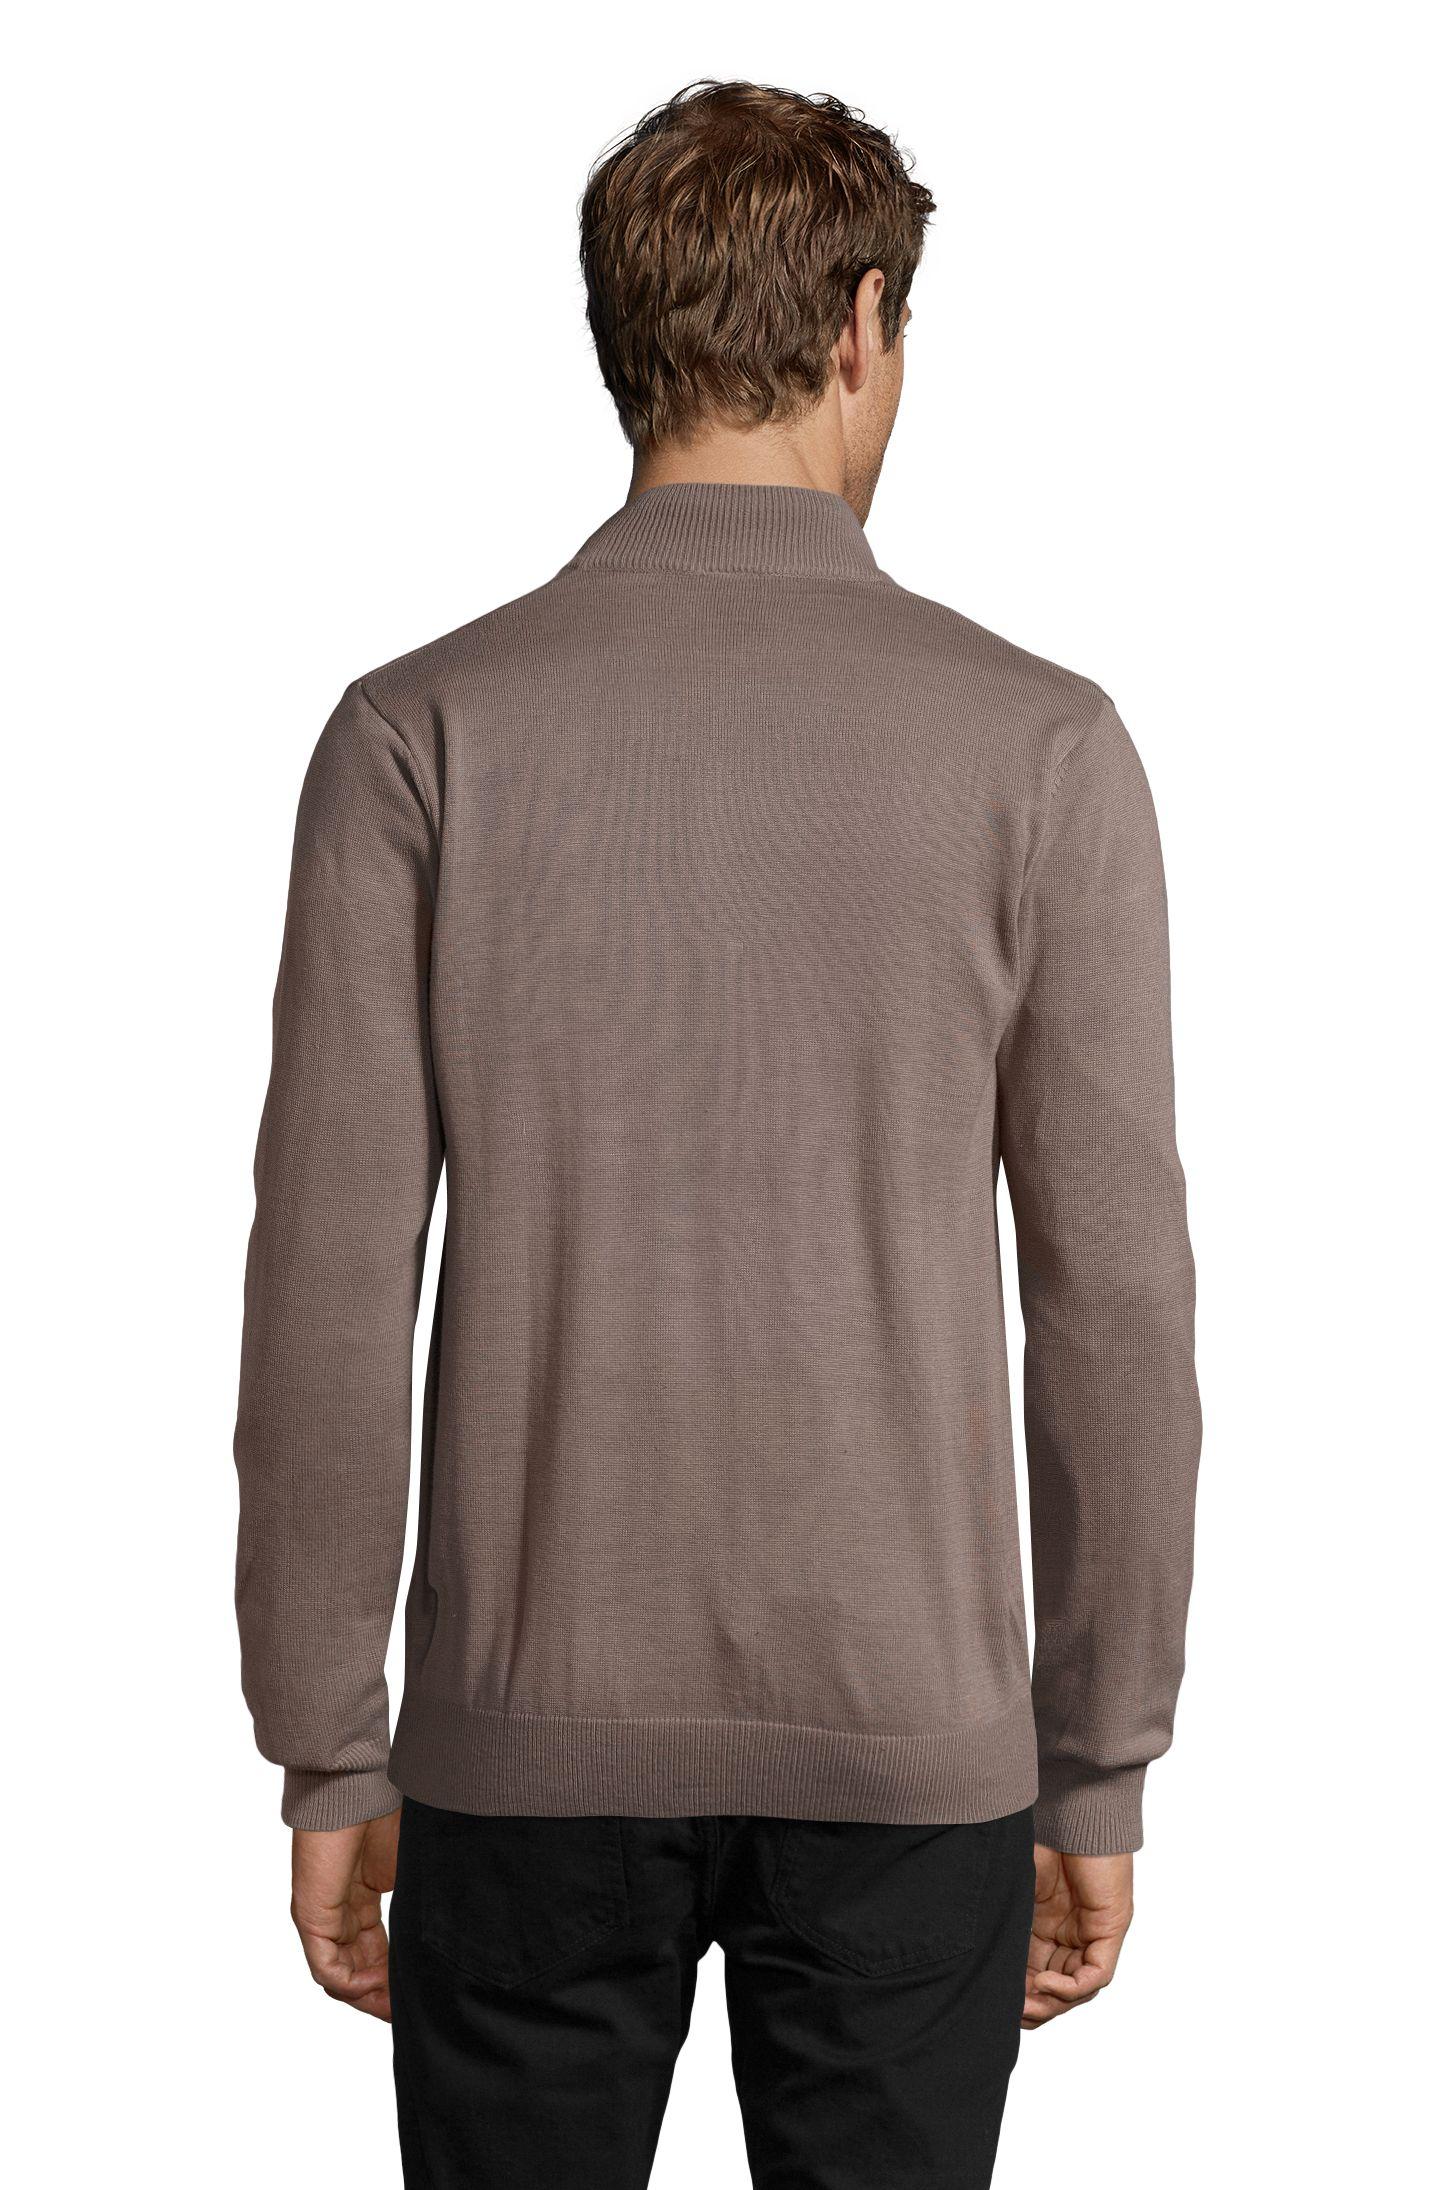 340 - Medium grey